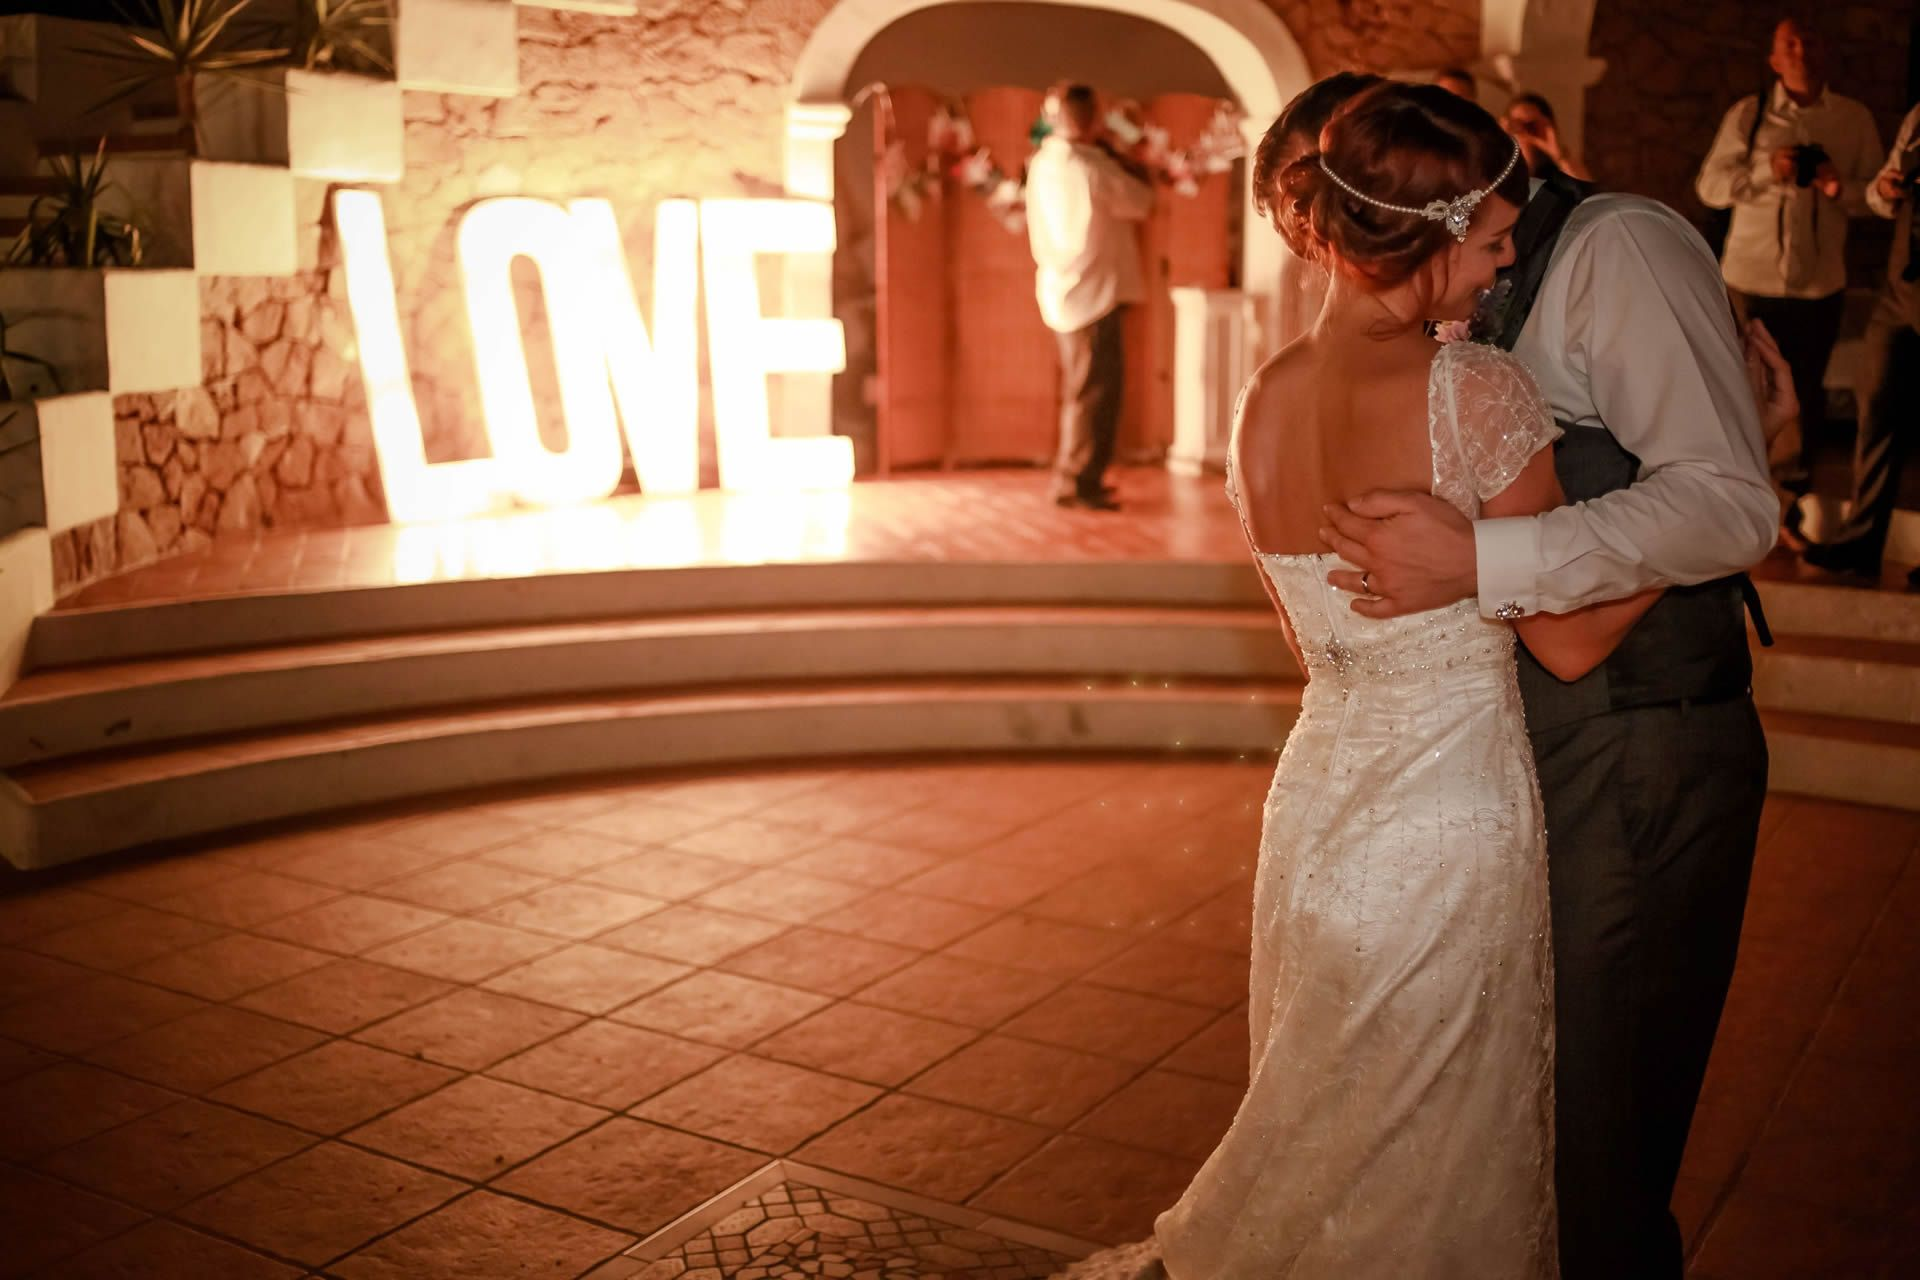 Cas Mila Ibiza Restaurant Cala Tarida Weddings Celebrations All Types Events